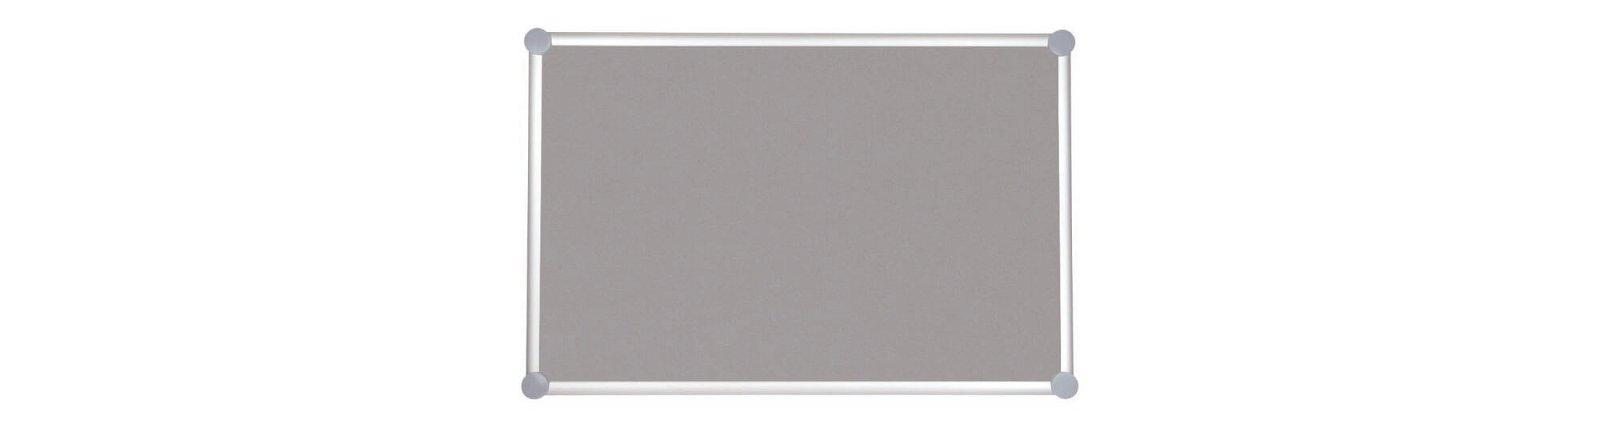 Pinnboard 2000 MAULpro, Textil, 90x180 cm, grau